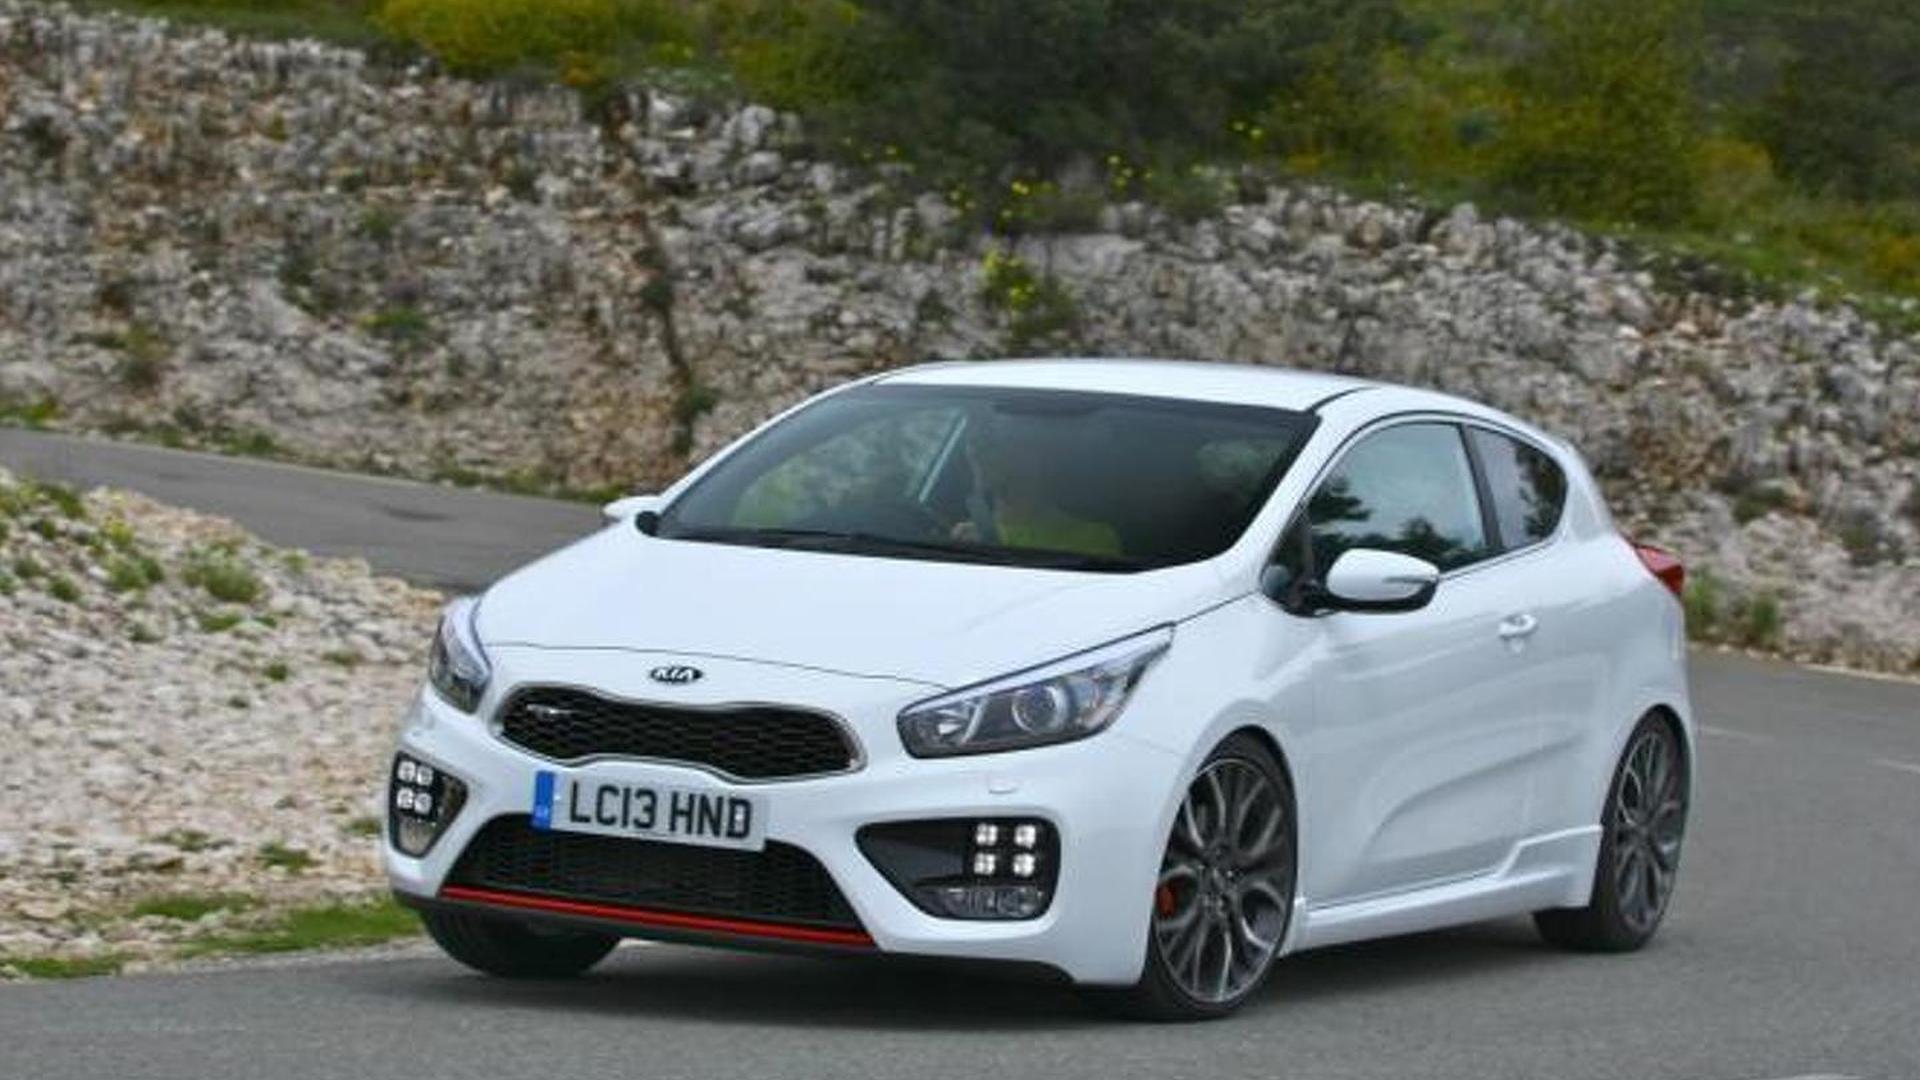 Kia planning more GT models - report